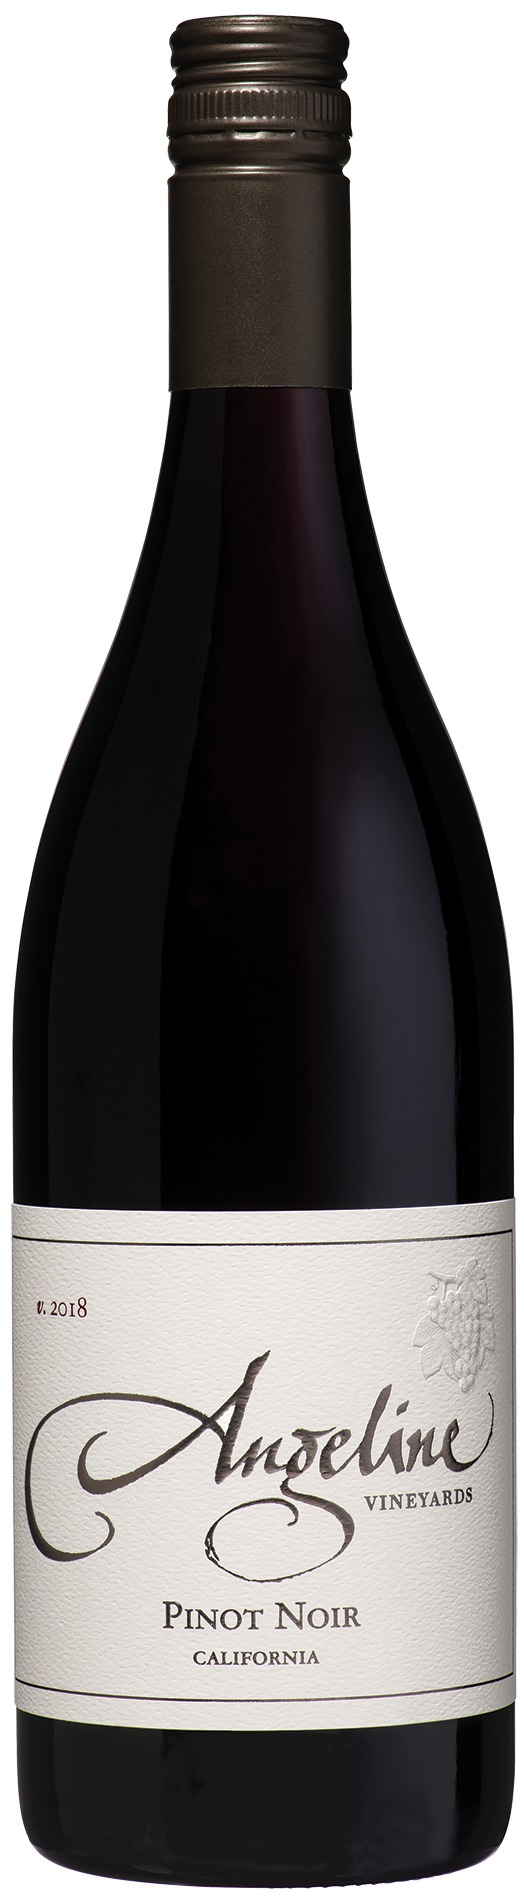 Angeline Pinot Noir 2018